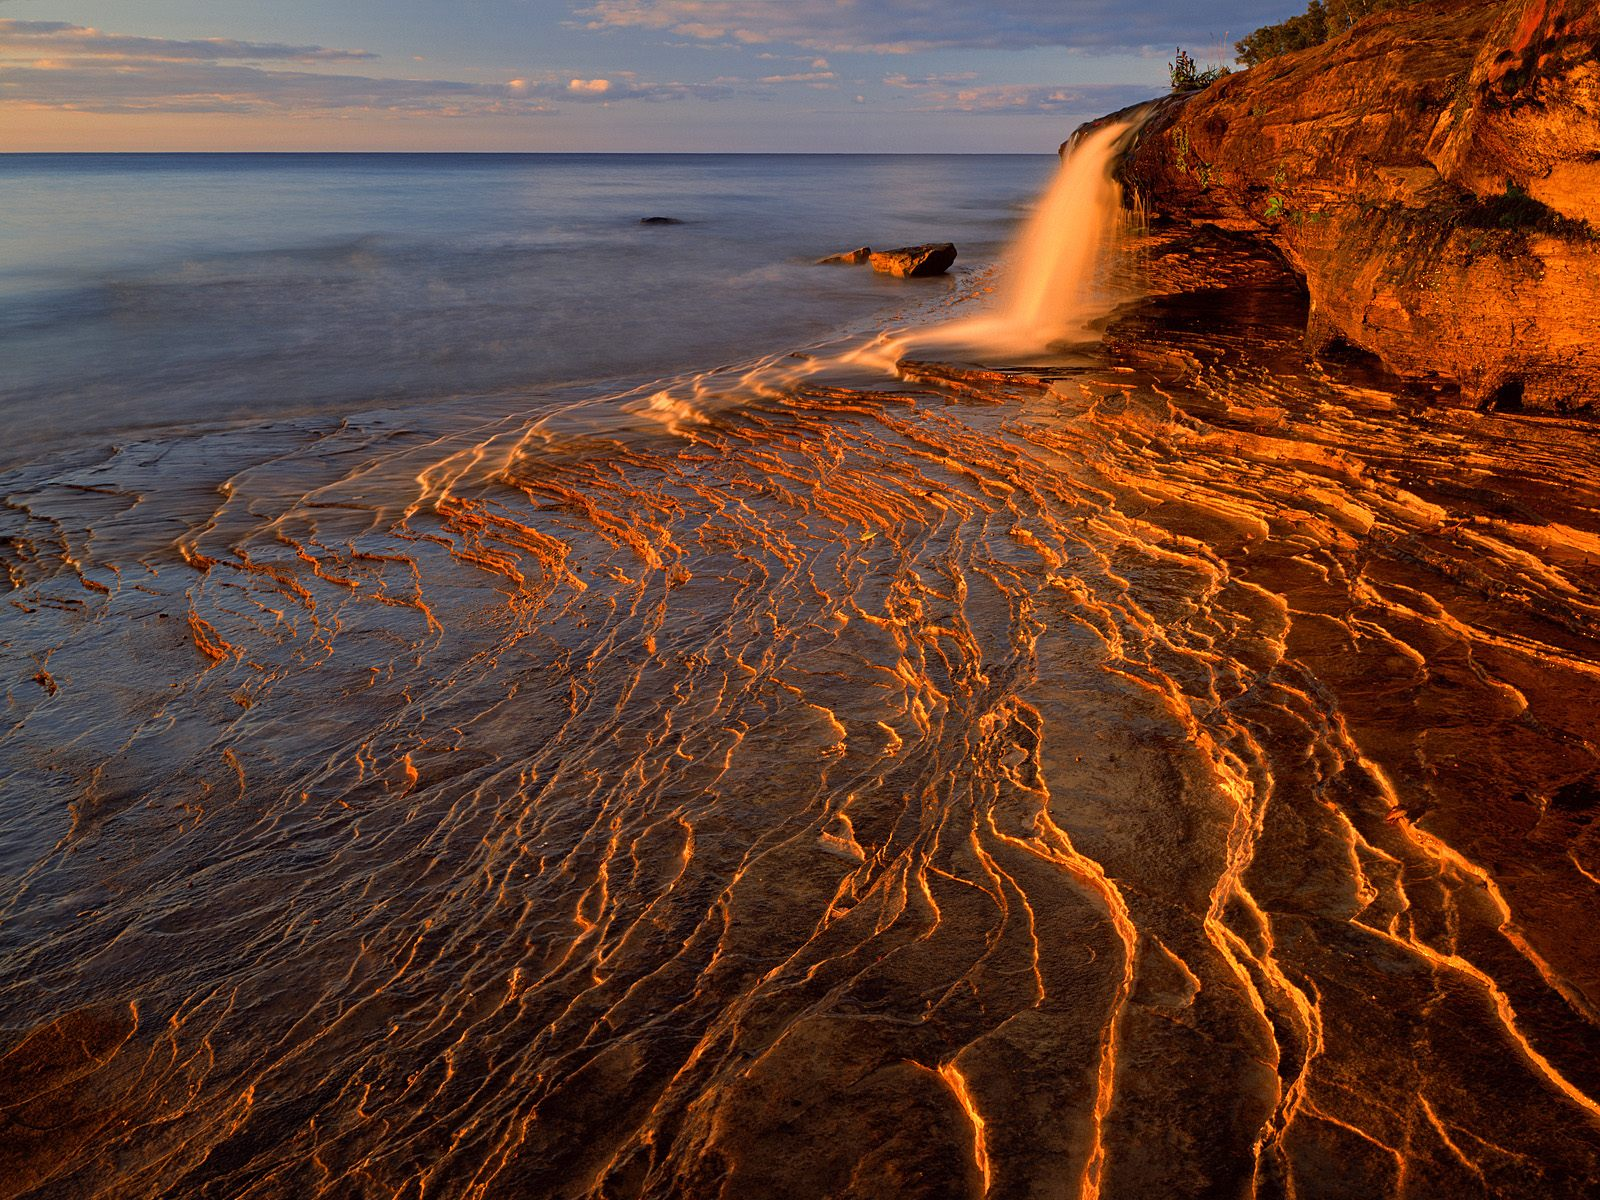 Lake superior pictured rocks national lakeshore michigan for Sfondi spettacolari